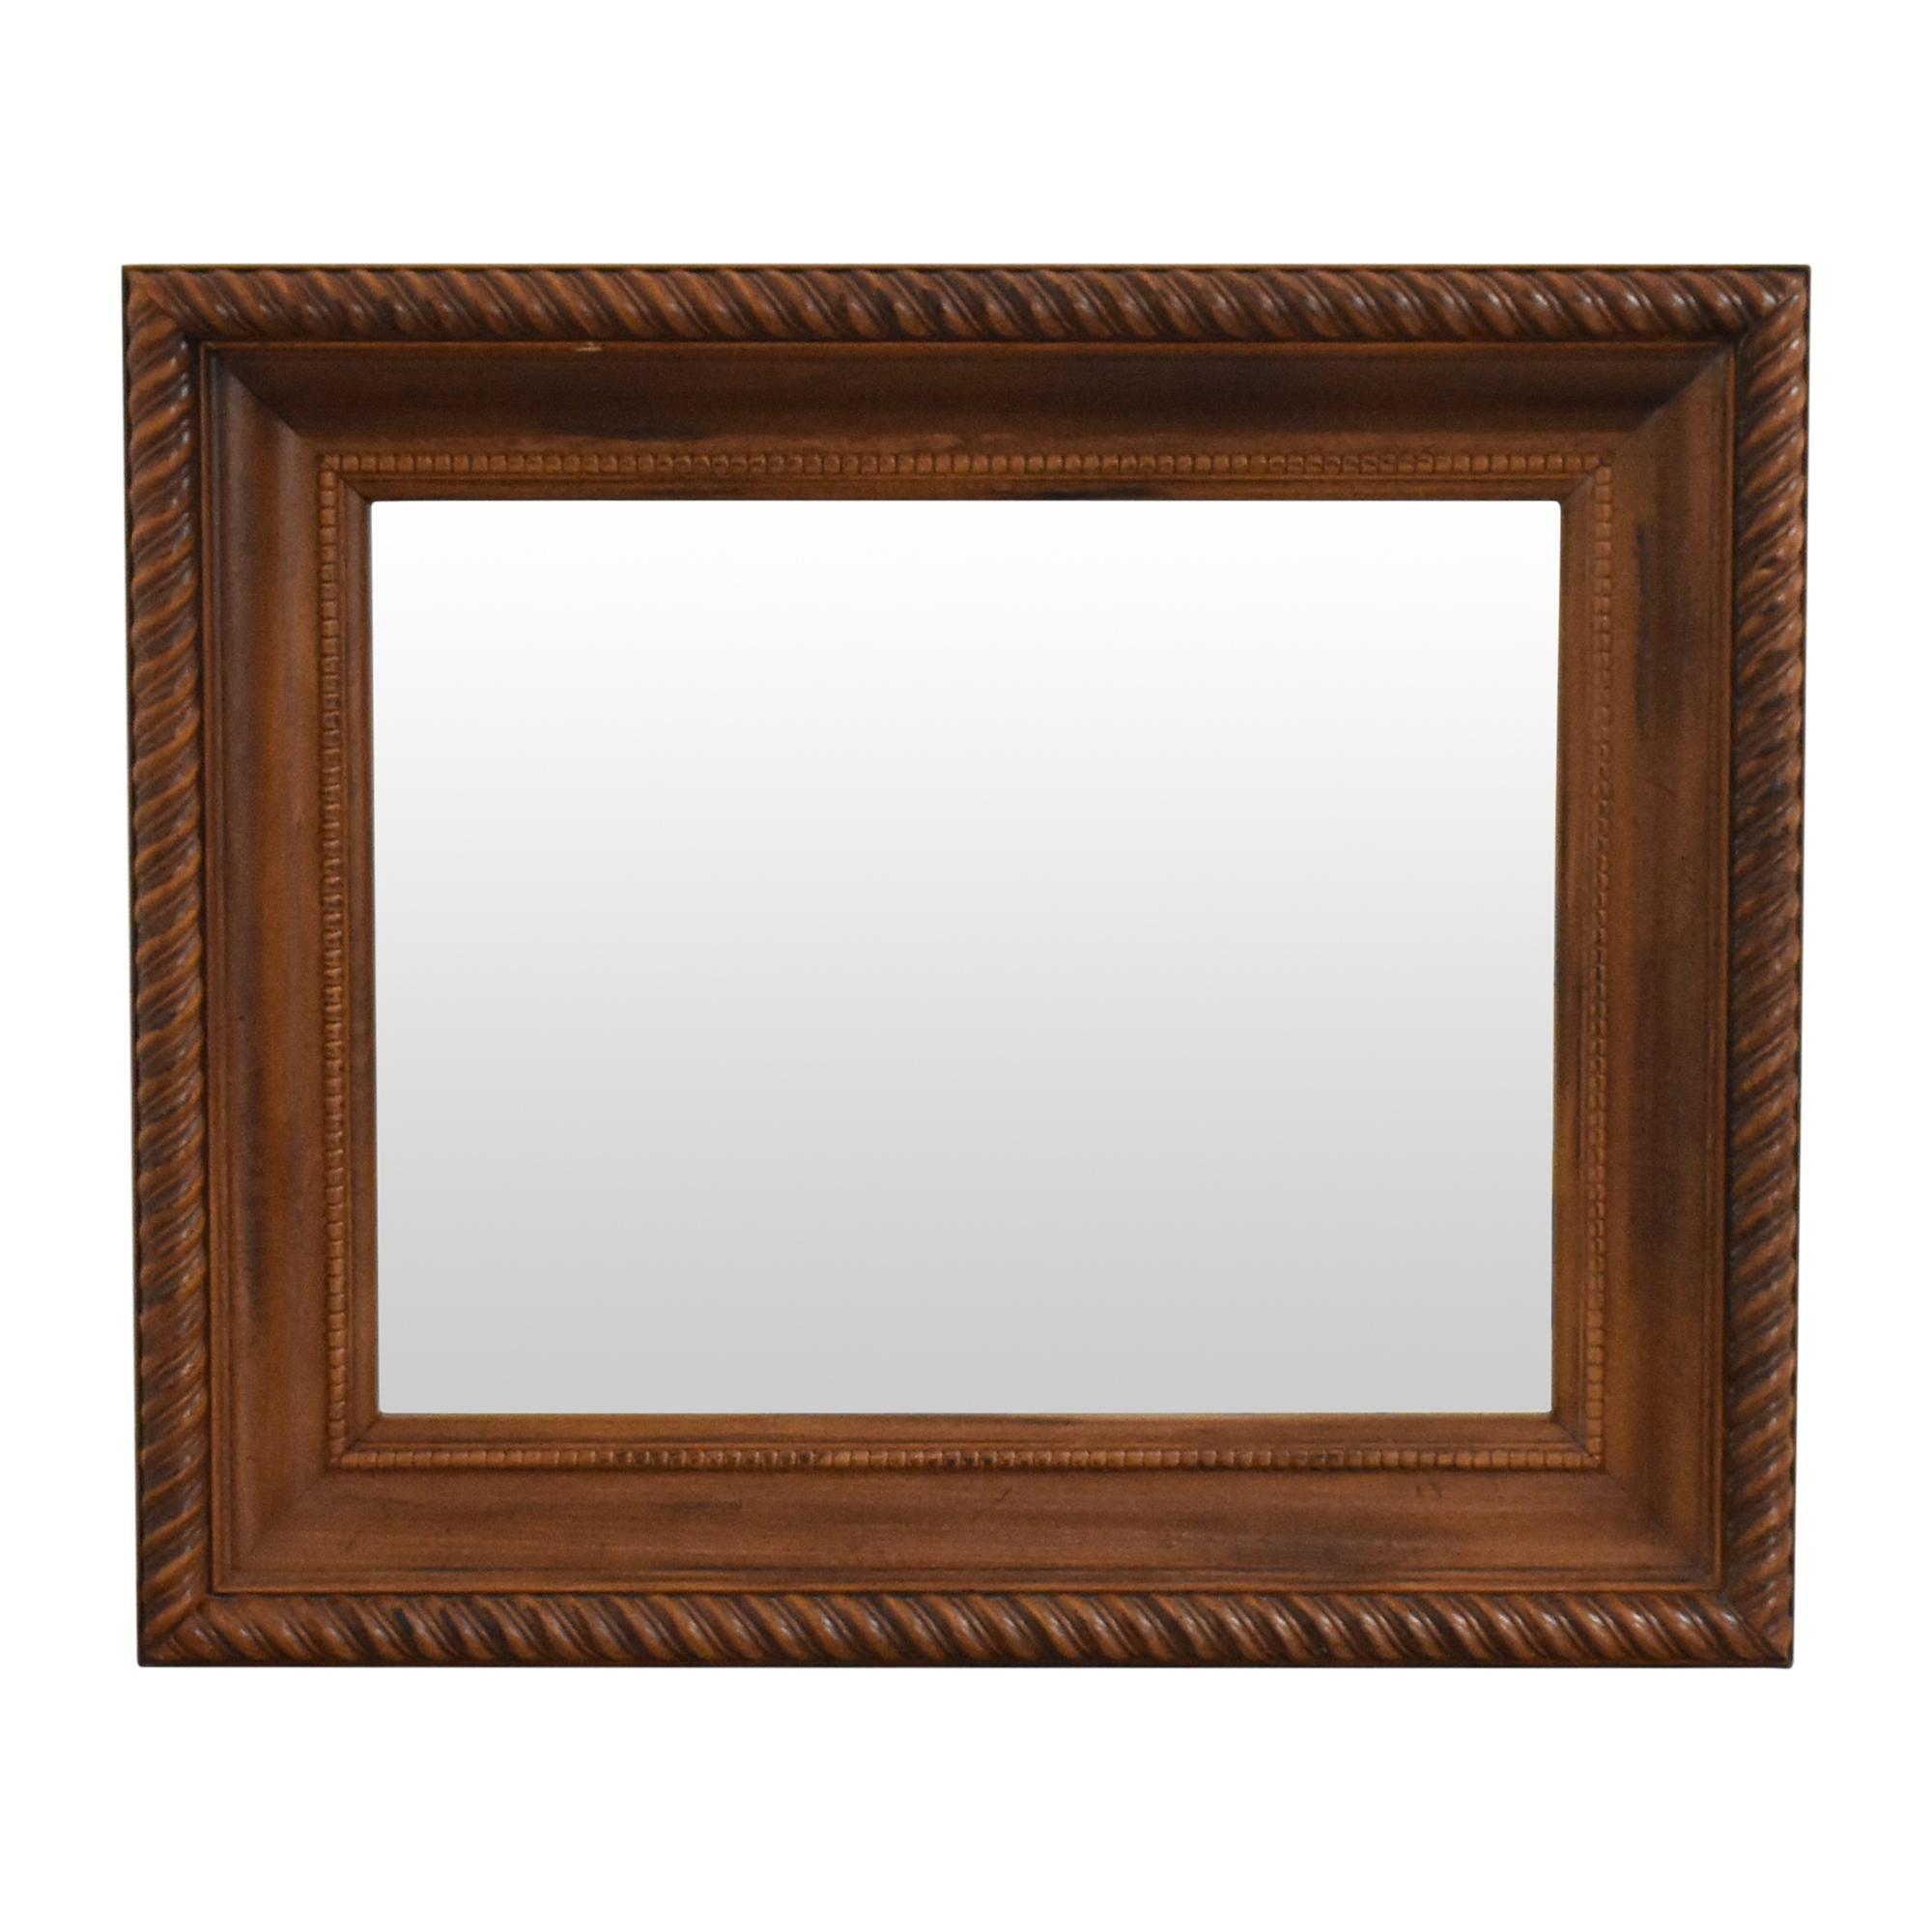 Cooper Classics Cooper Classics Barley Twist Framed Mirror on sale